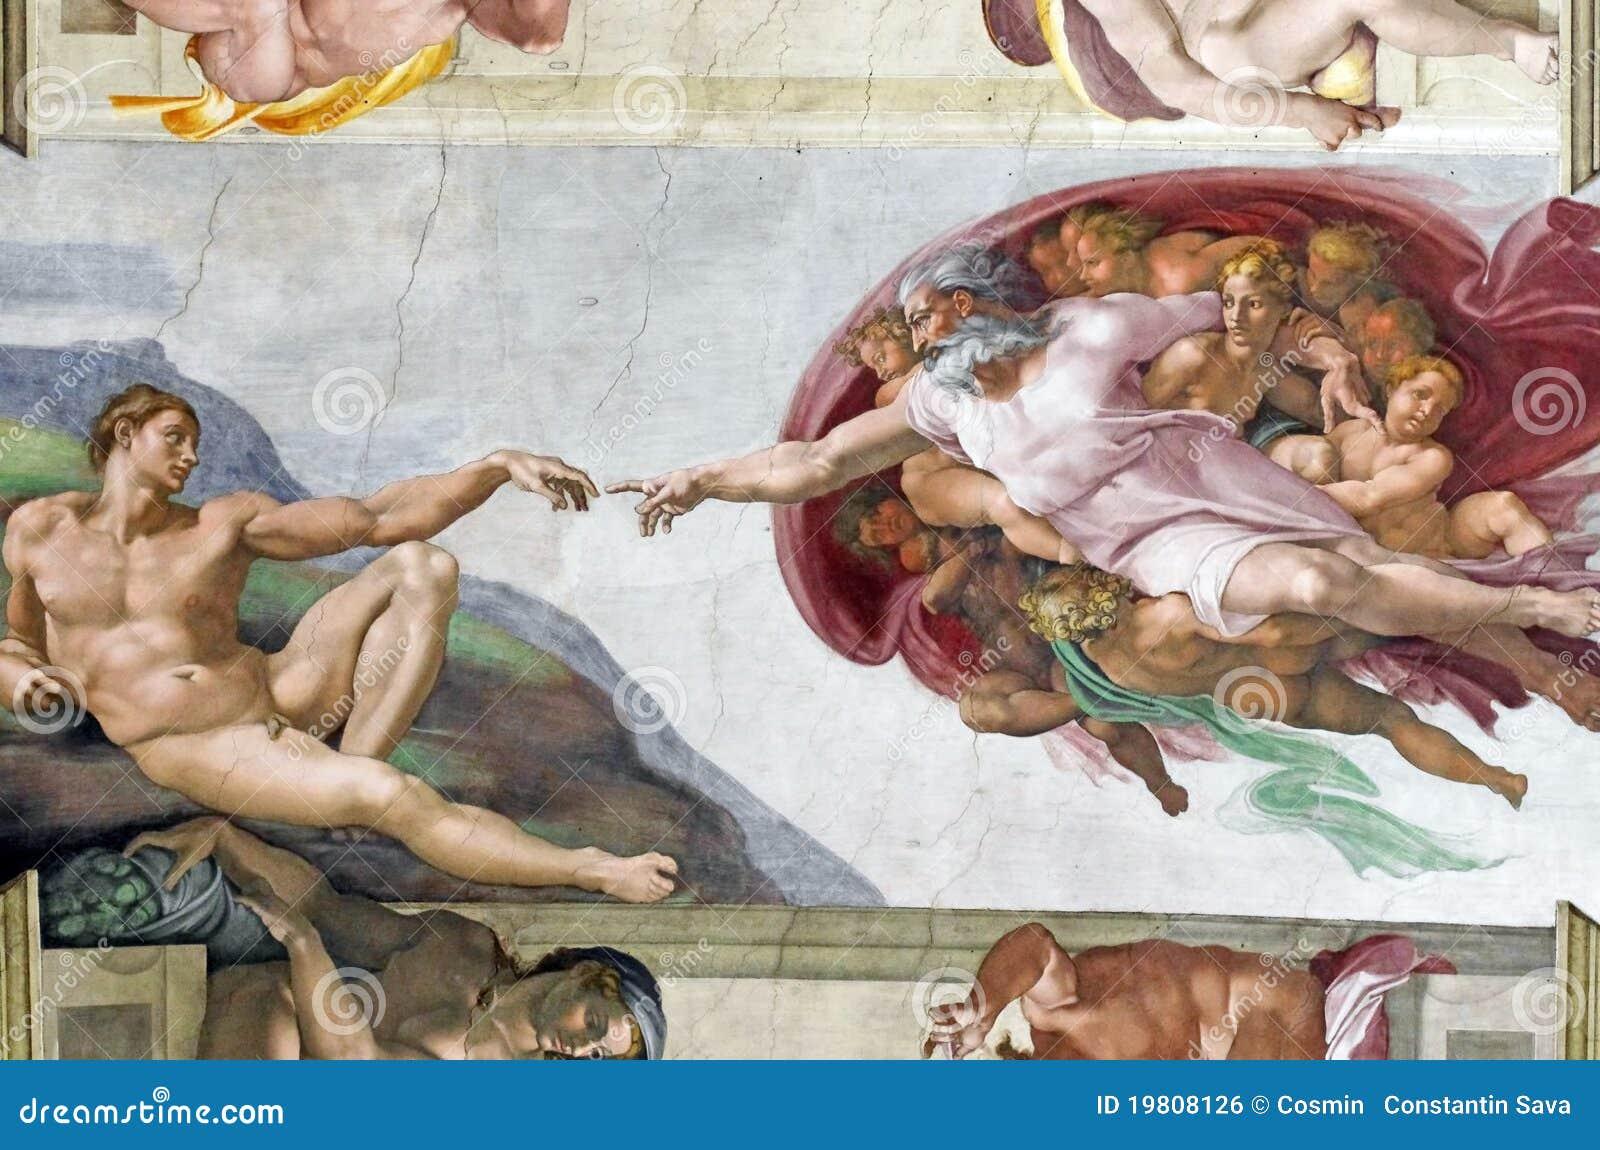 Kaplicy frescoes Michelangelo s sistine